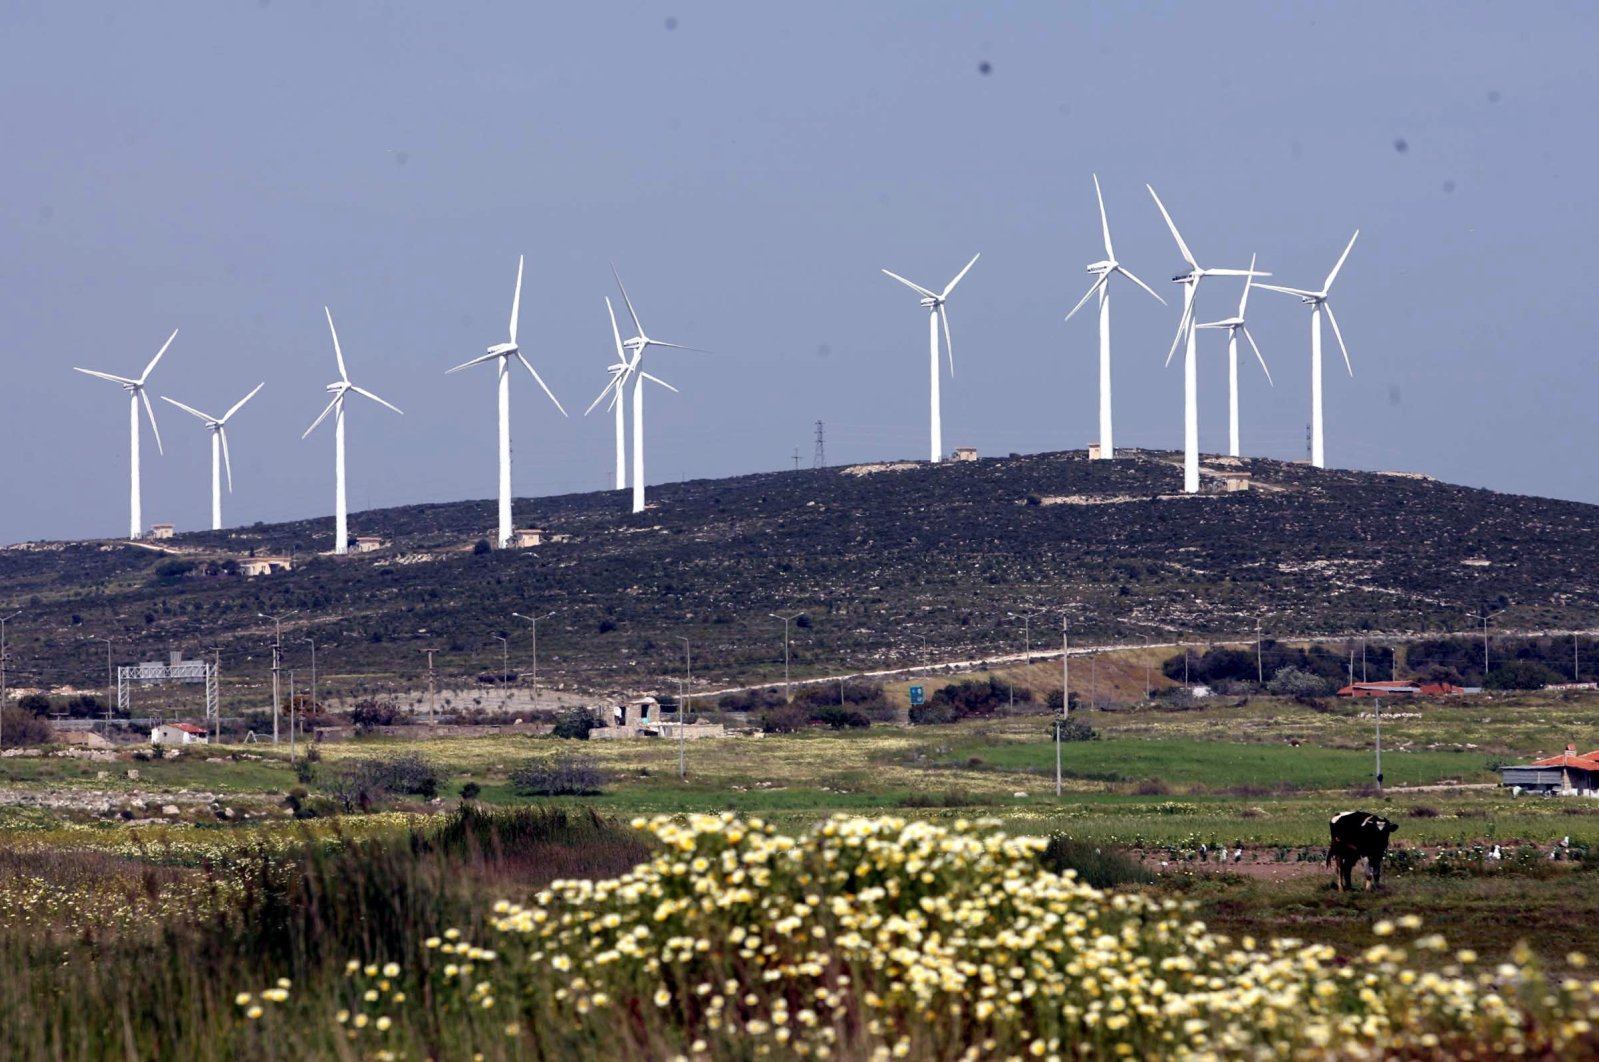 Wind turbines are seen in Karaburun district of Turkey's Aegean province of İzmir, Feb. 13, 2019. (DHA Photo)